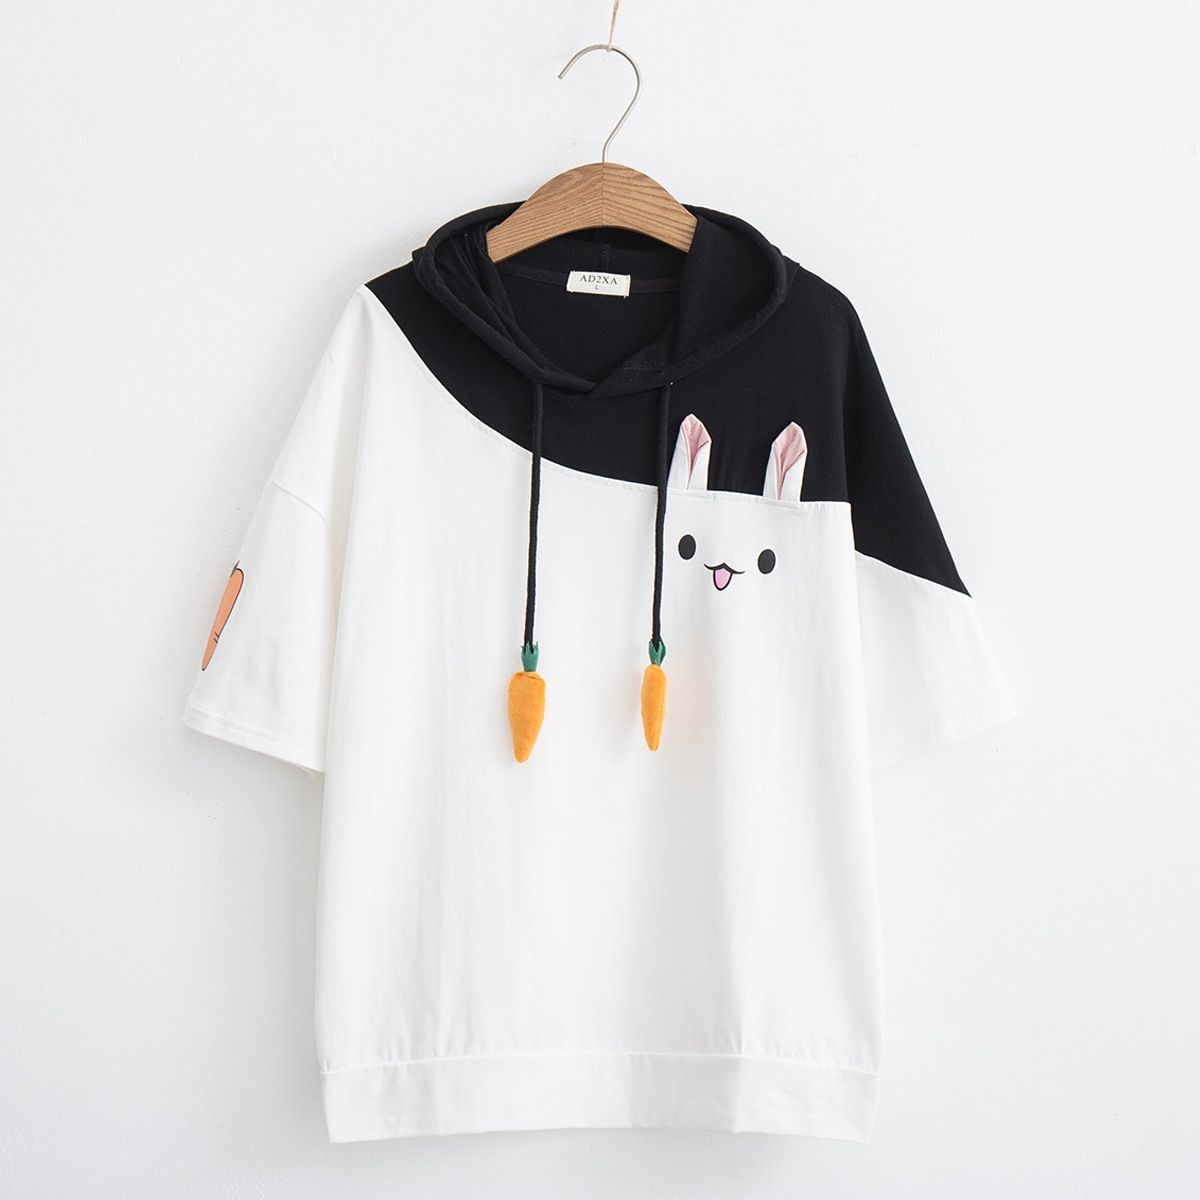 Japanese Summer Soft Sister Female T Shirts Cute Fashion Short Sleeve Bandage Anime Bunny Tee Tops Mori Girl Kawaii T Shirt